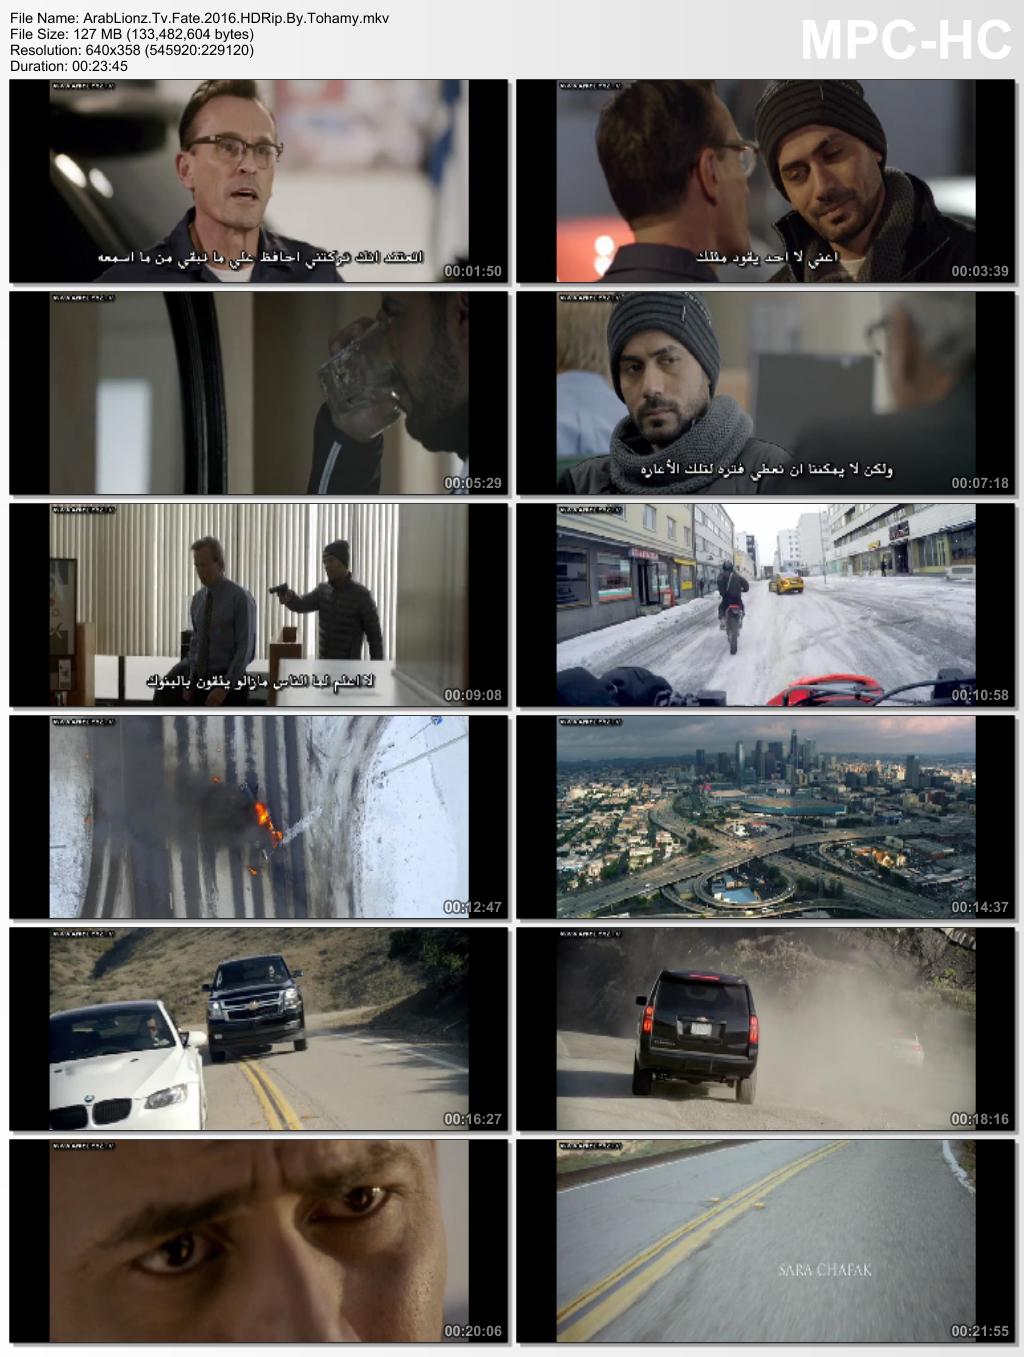 تحميل ومشاهدة  فيلم Fate 2016 HDRip مترجم   مشاهده اون لاين  GCCYFHiC